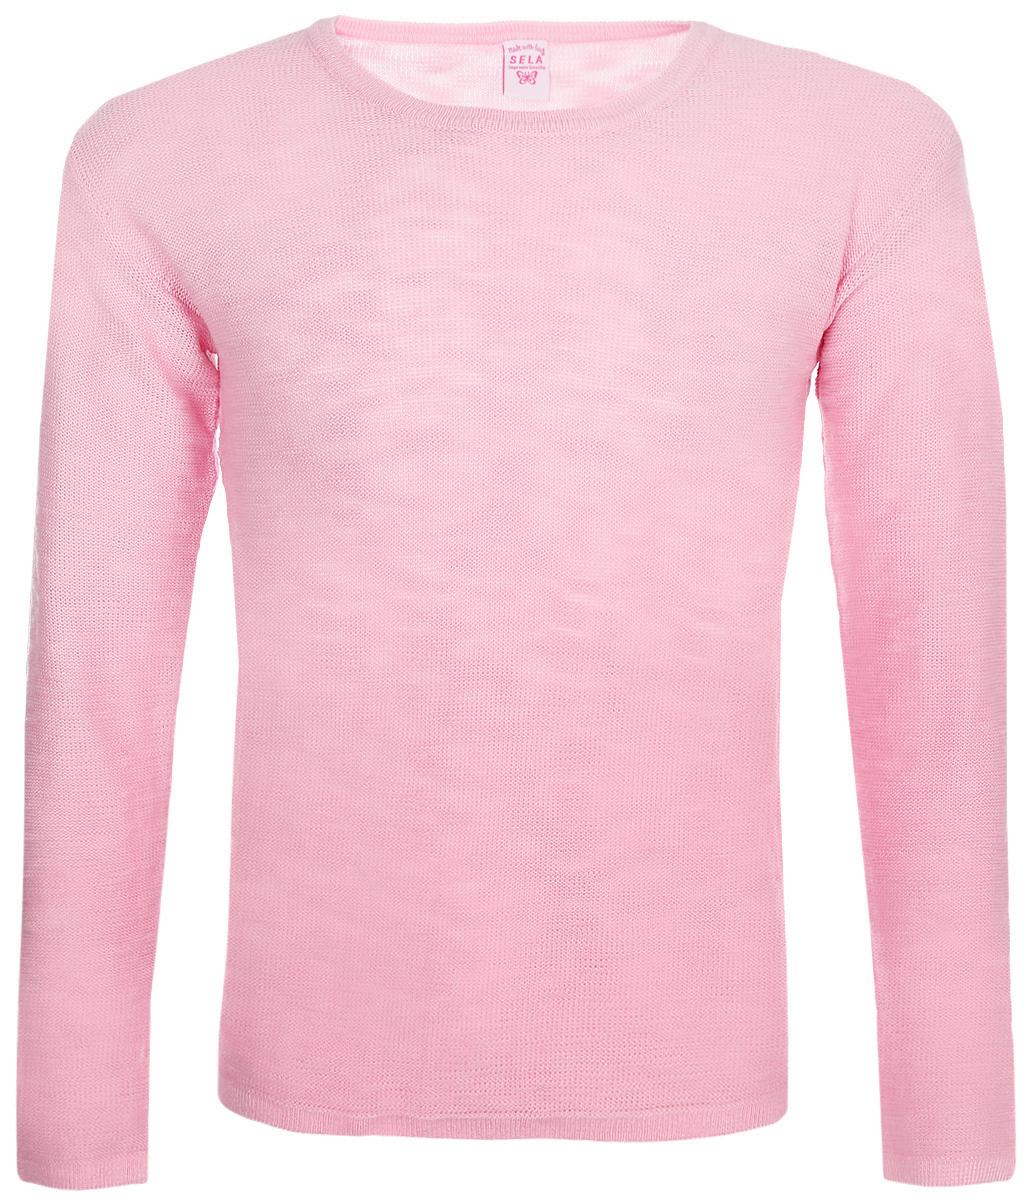 Джемпер для девочки Sela, цвет: розовый. JR-614/972-8161. Размер 152 цена